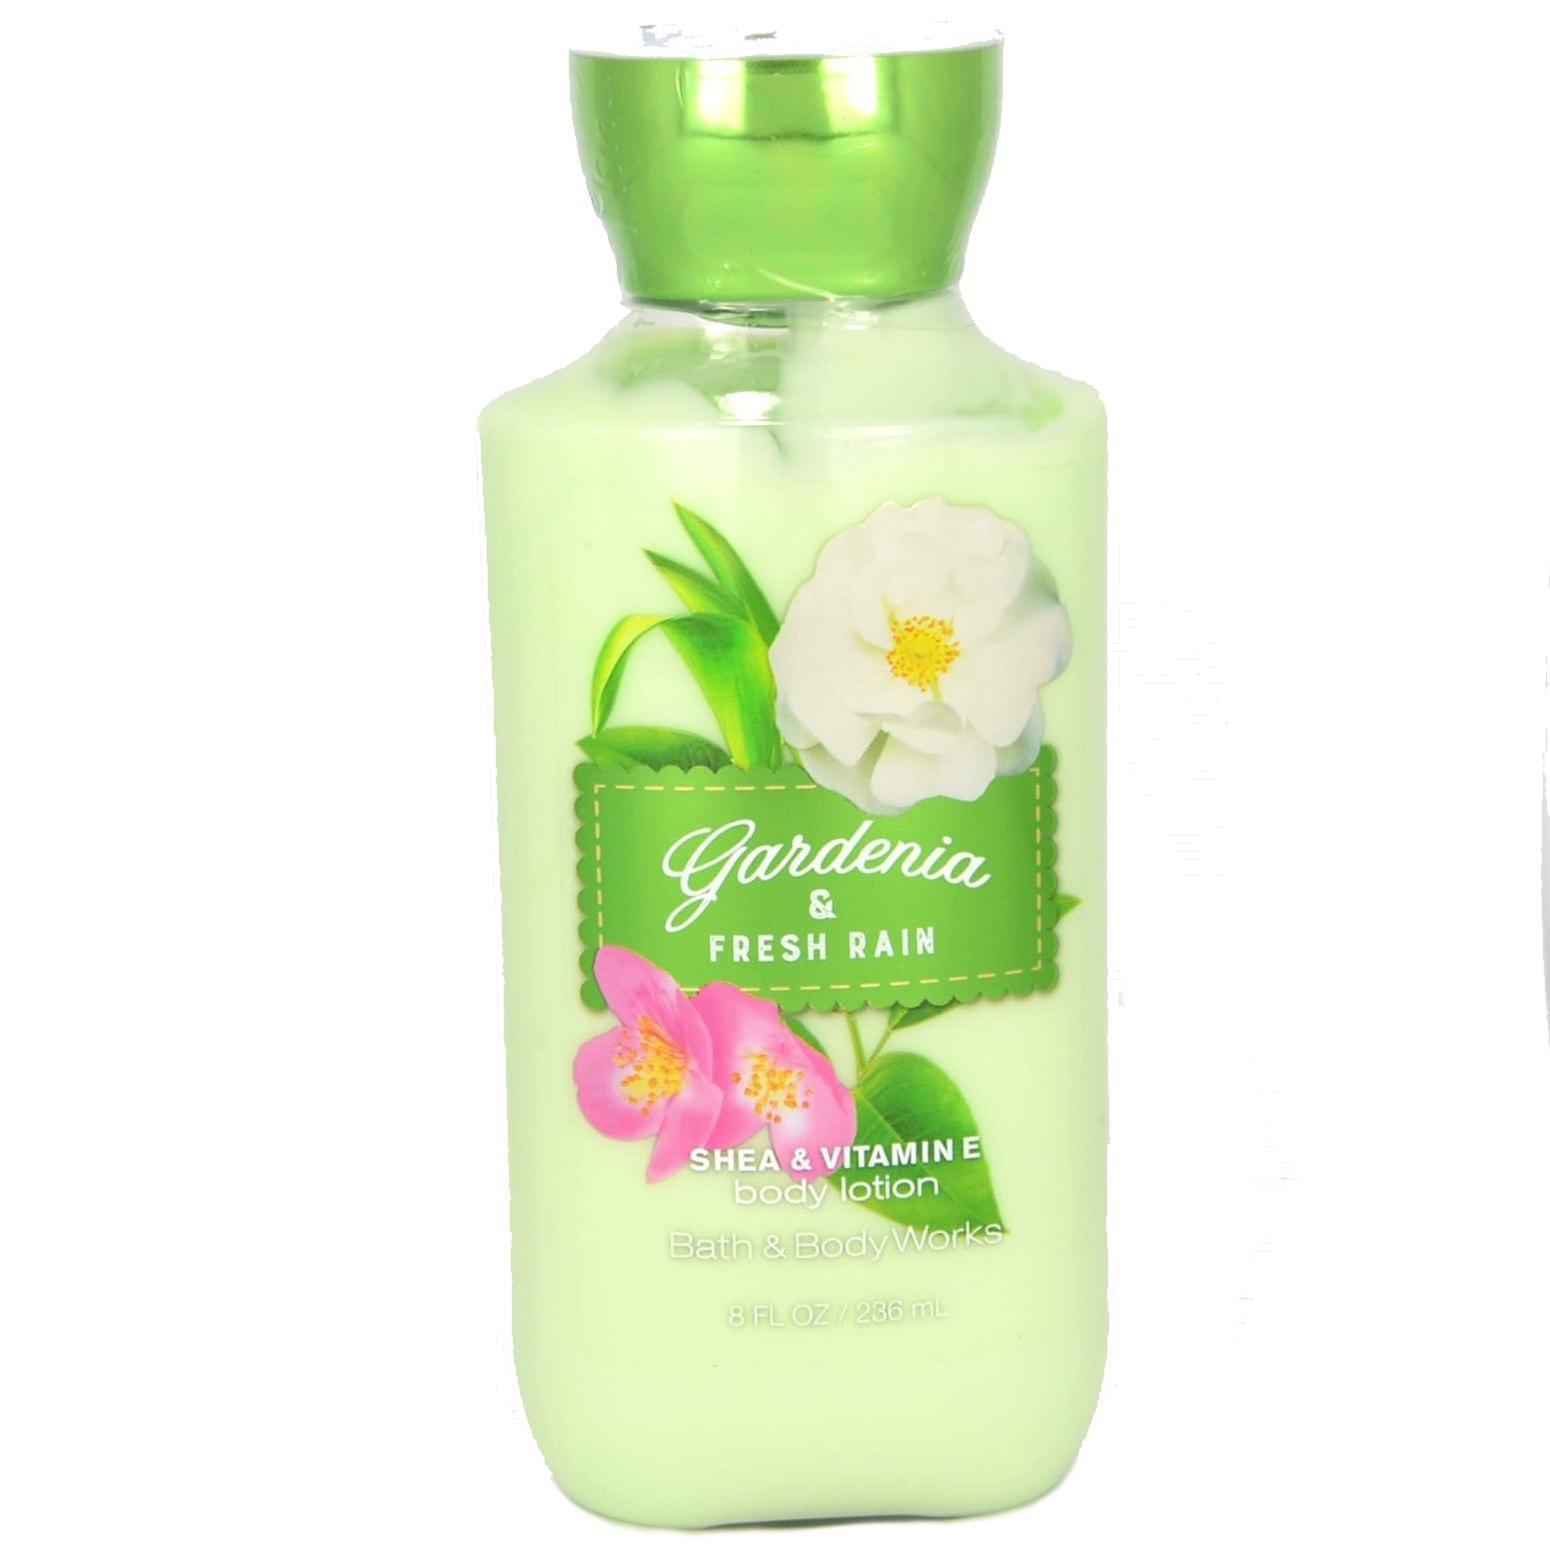 Lait Pour Le Corps Gardenia Amp Fresh Rain Bath And Body